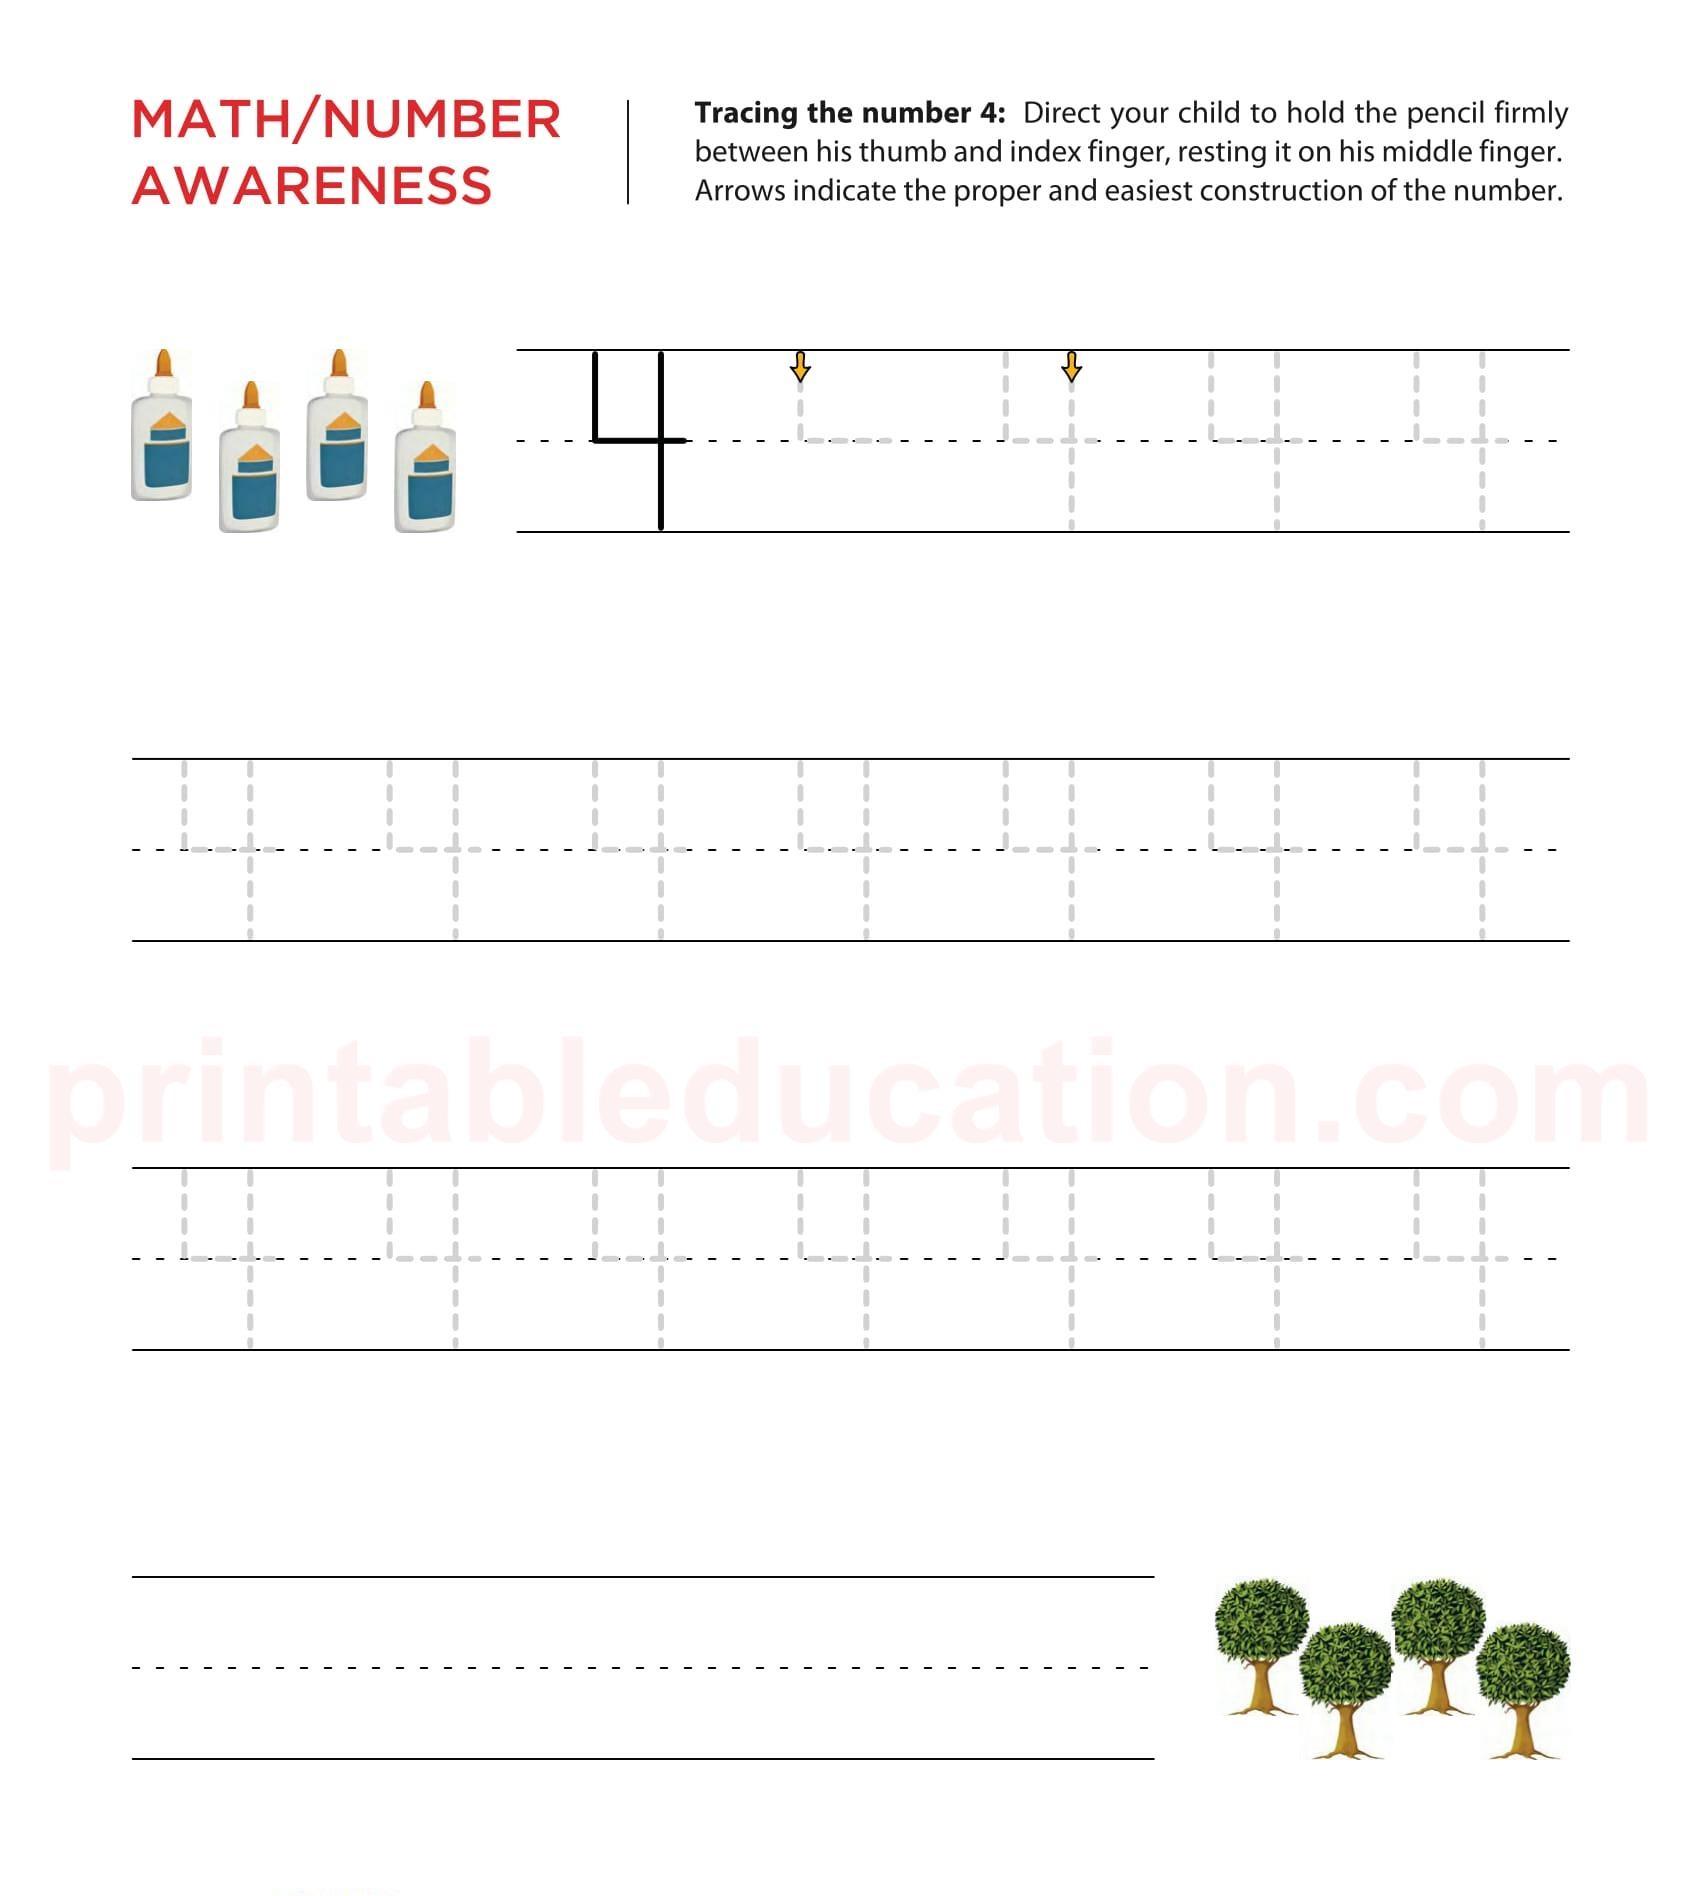 Tracing Number Practice Worksheet | PrintablEducation